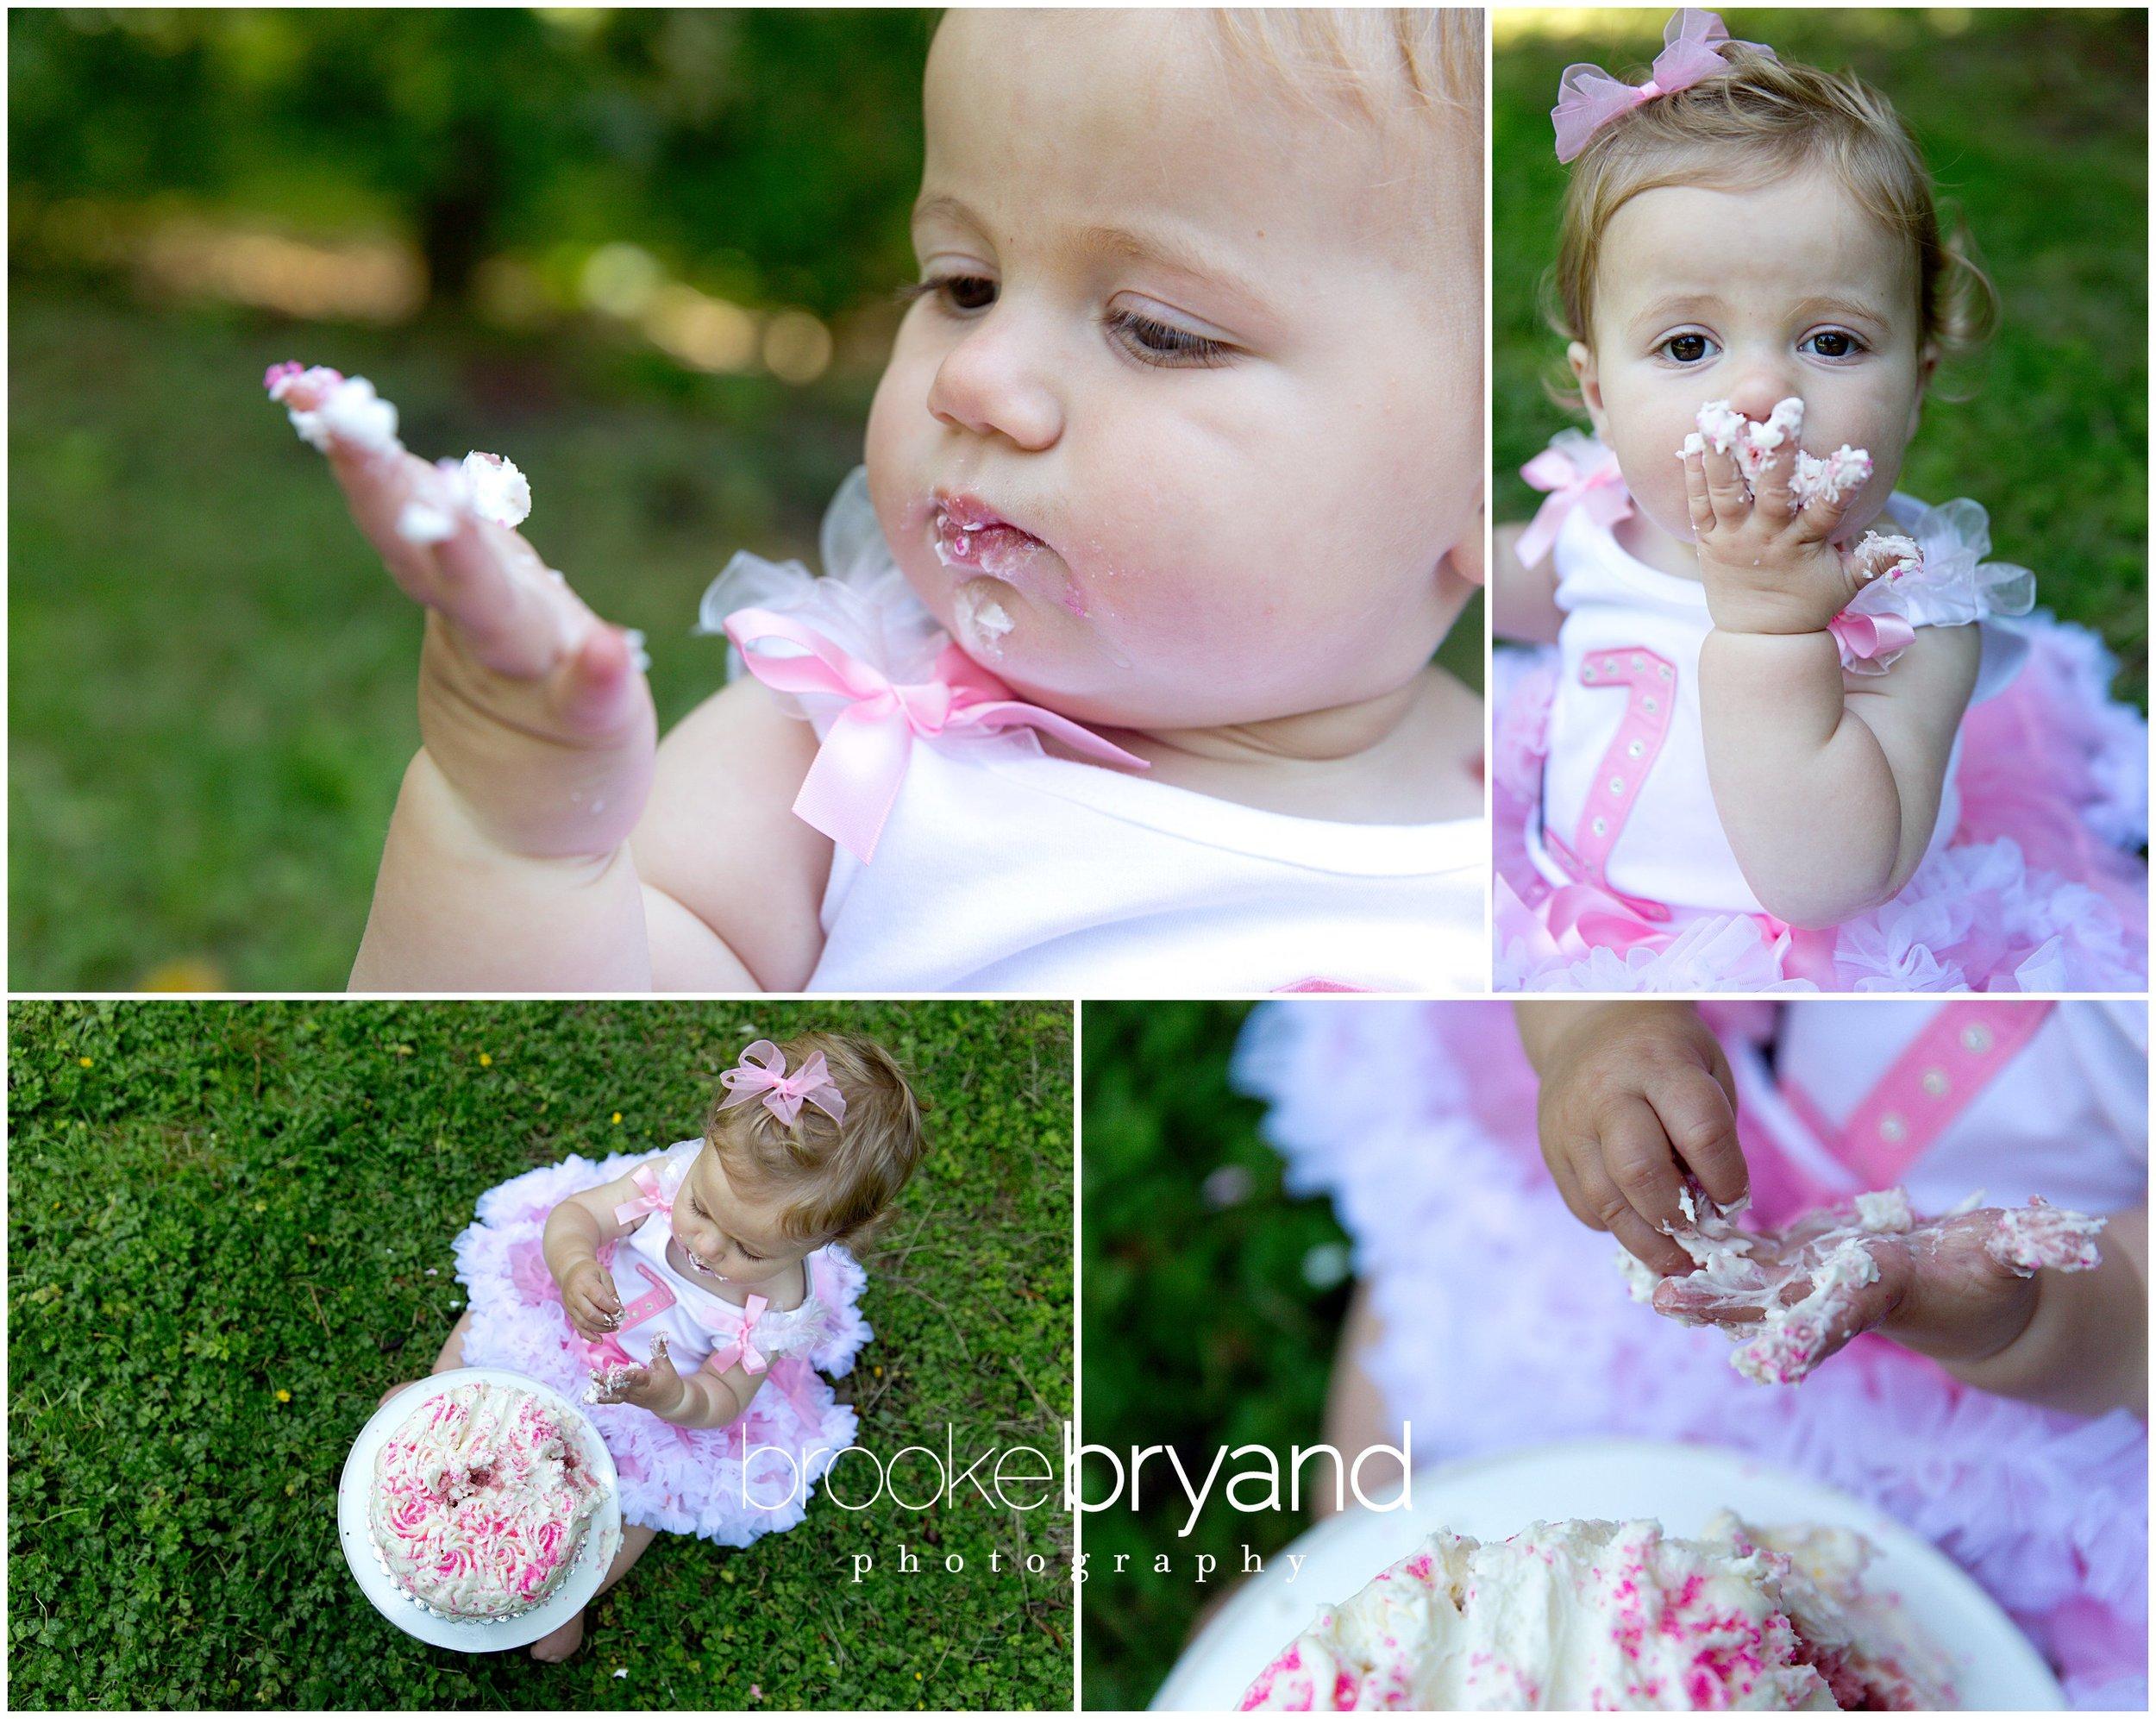 08.2014-Burns-1st-Birthday-Cake-Smash-BBP_1407_San-Francisco-Family-Photos-Brooke-Bryand-Photography.jpg